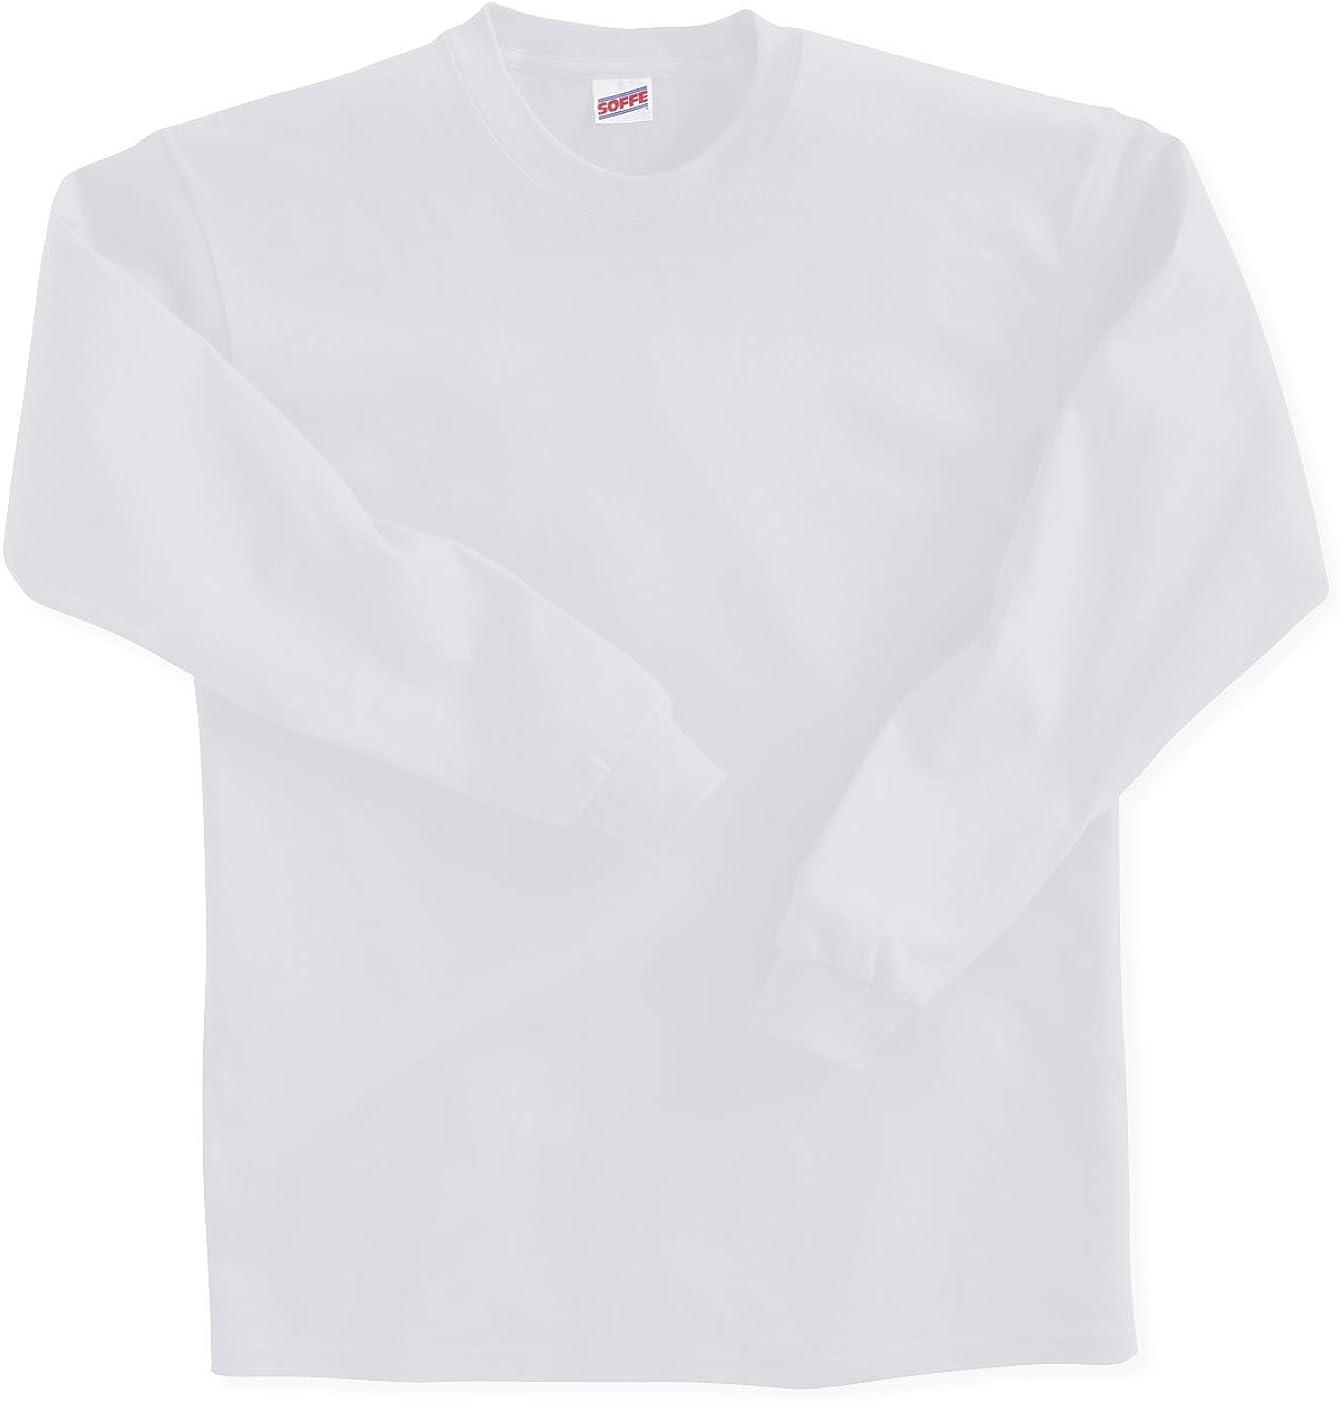 Soffe Big Boys' Long Sleeve Cotton T-Shirt